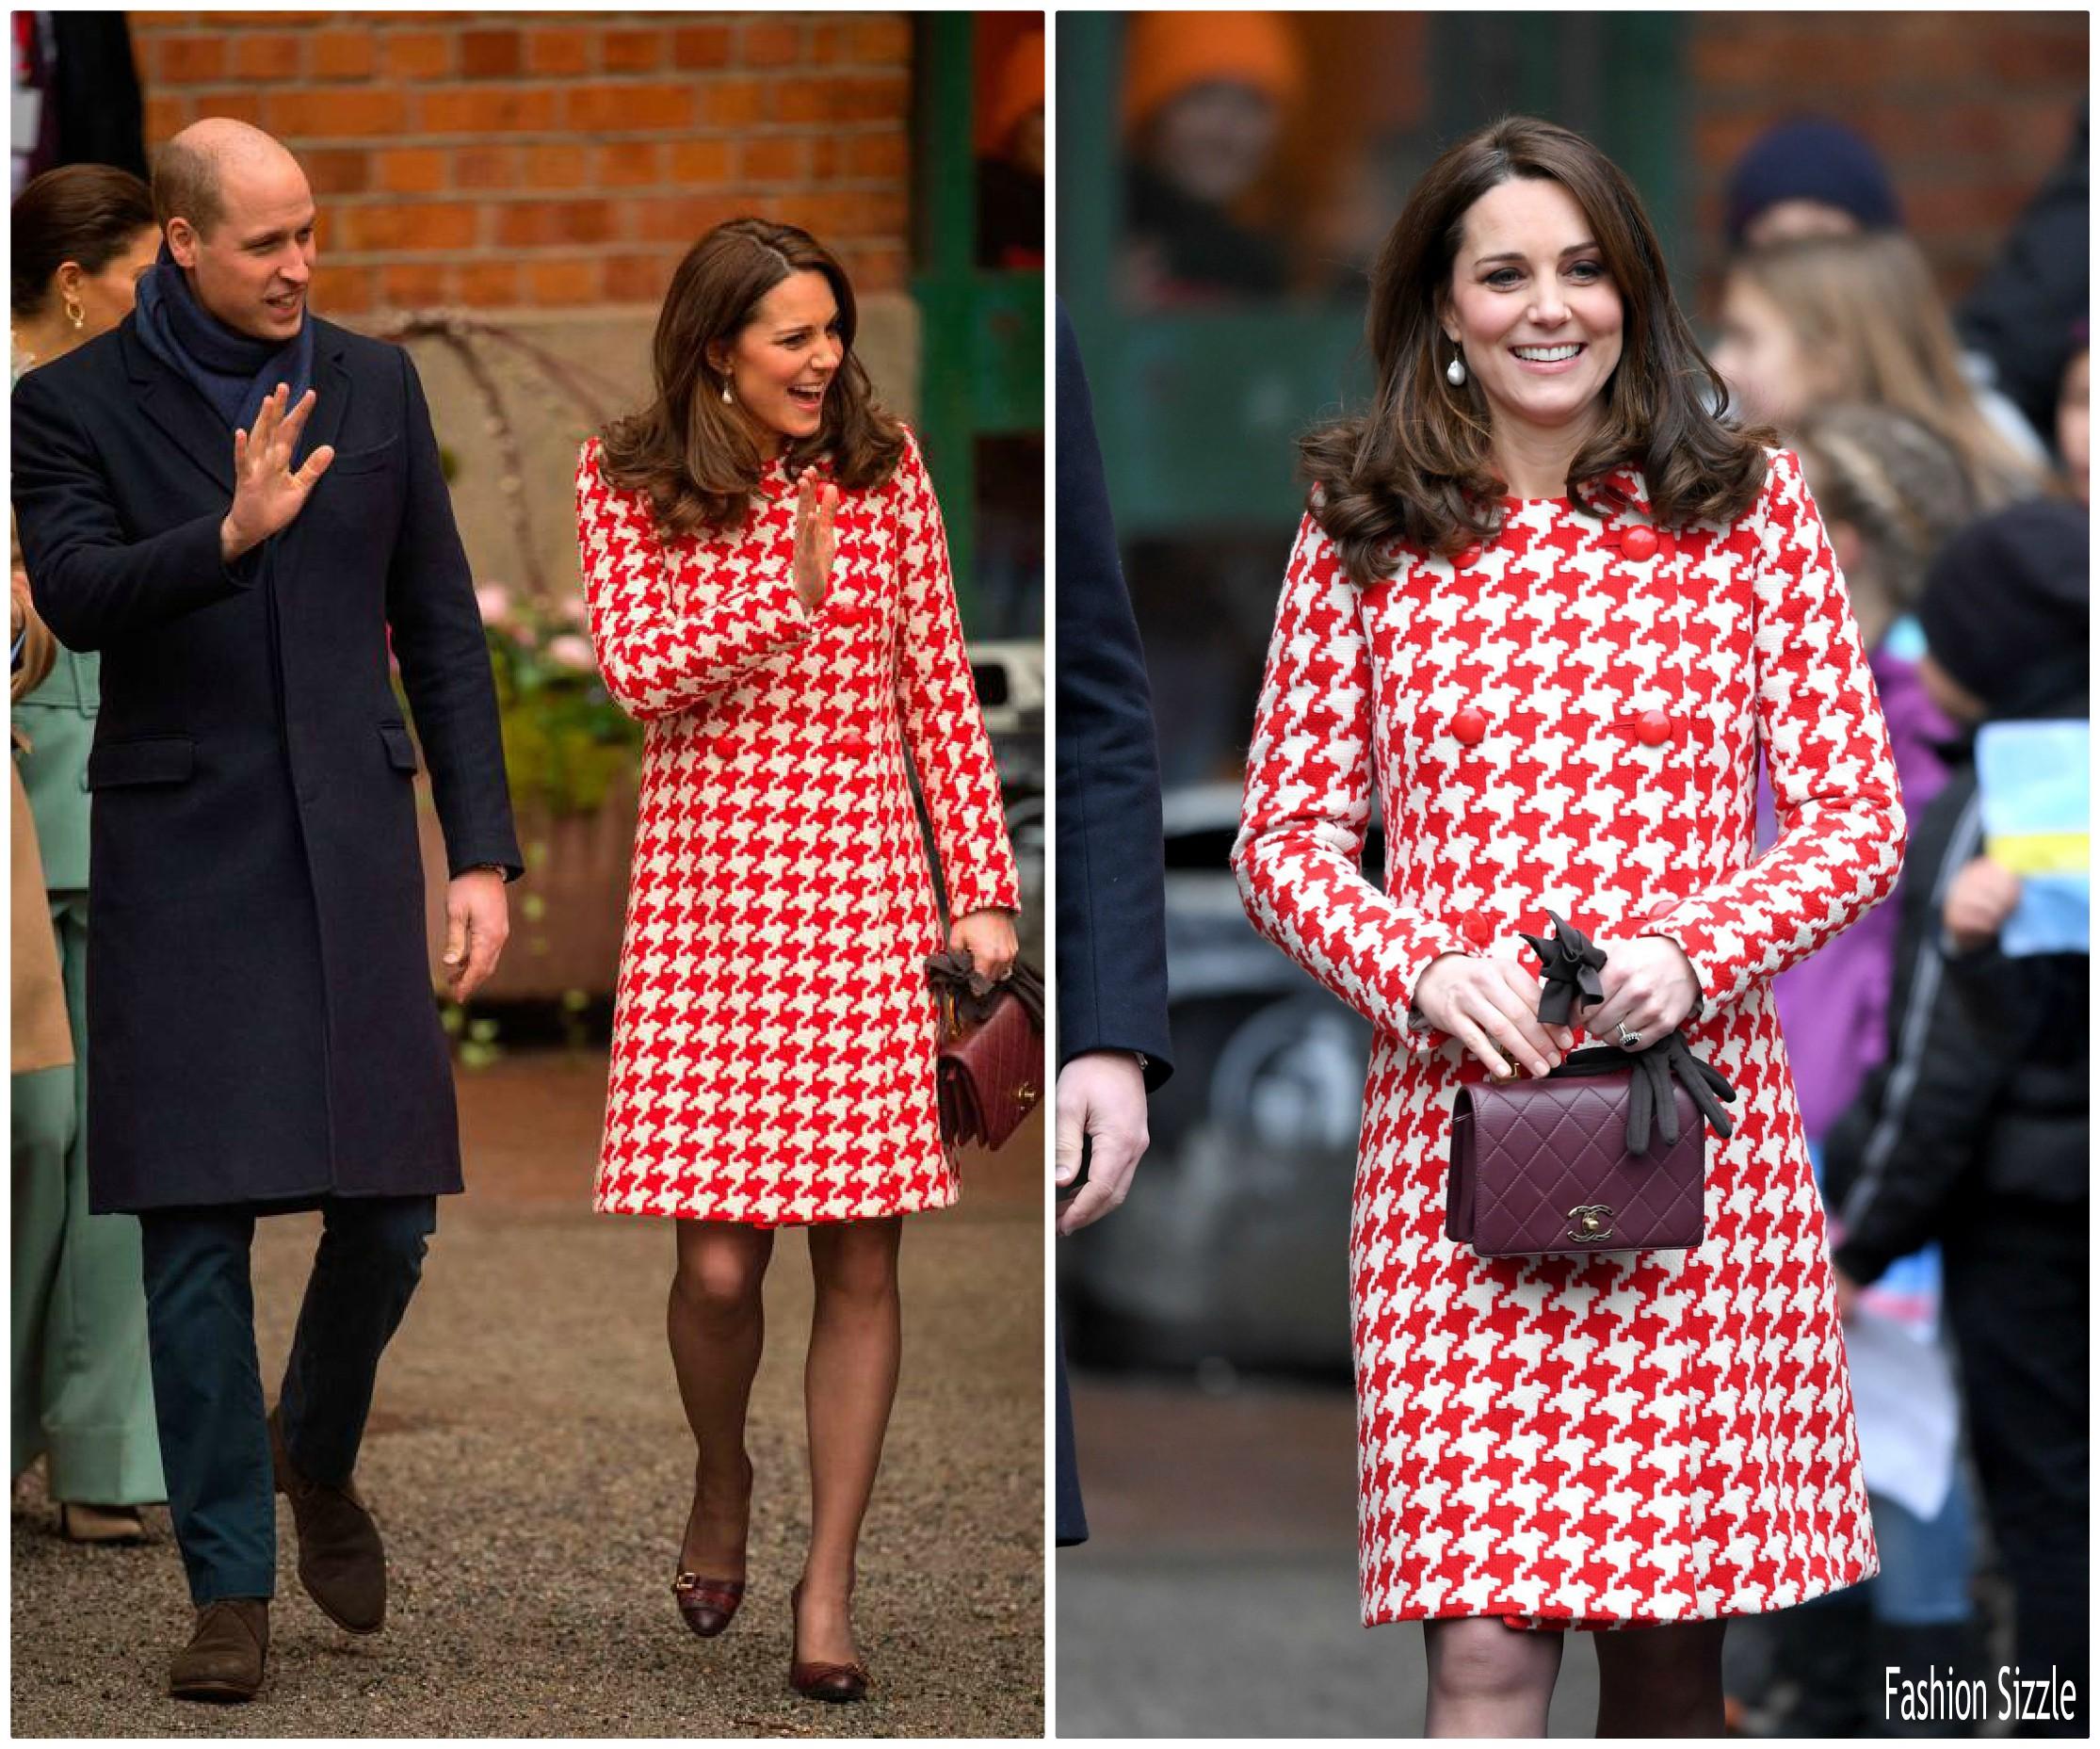 duchess-of-cambridge-in-catherine-walker-visit-to-sweden-day-2